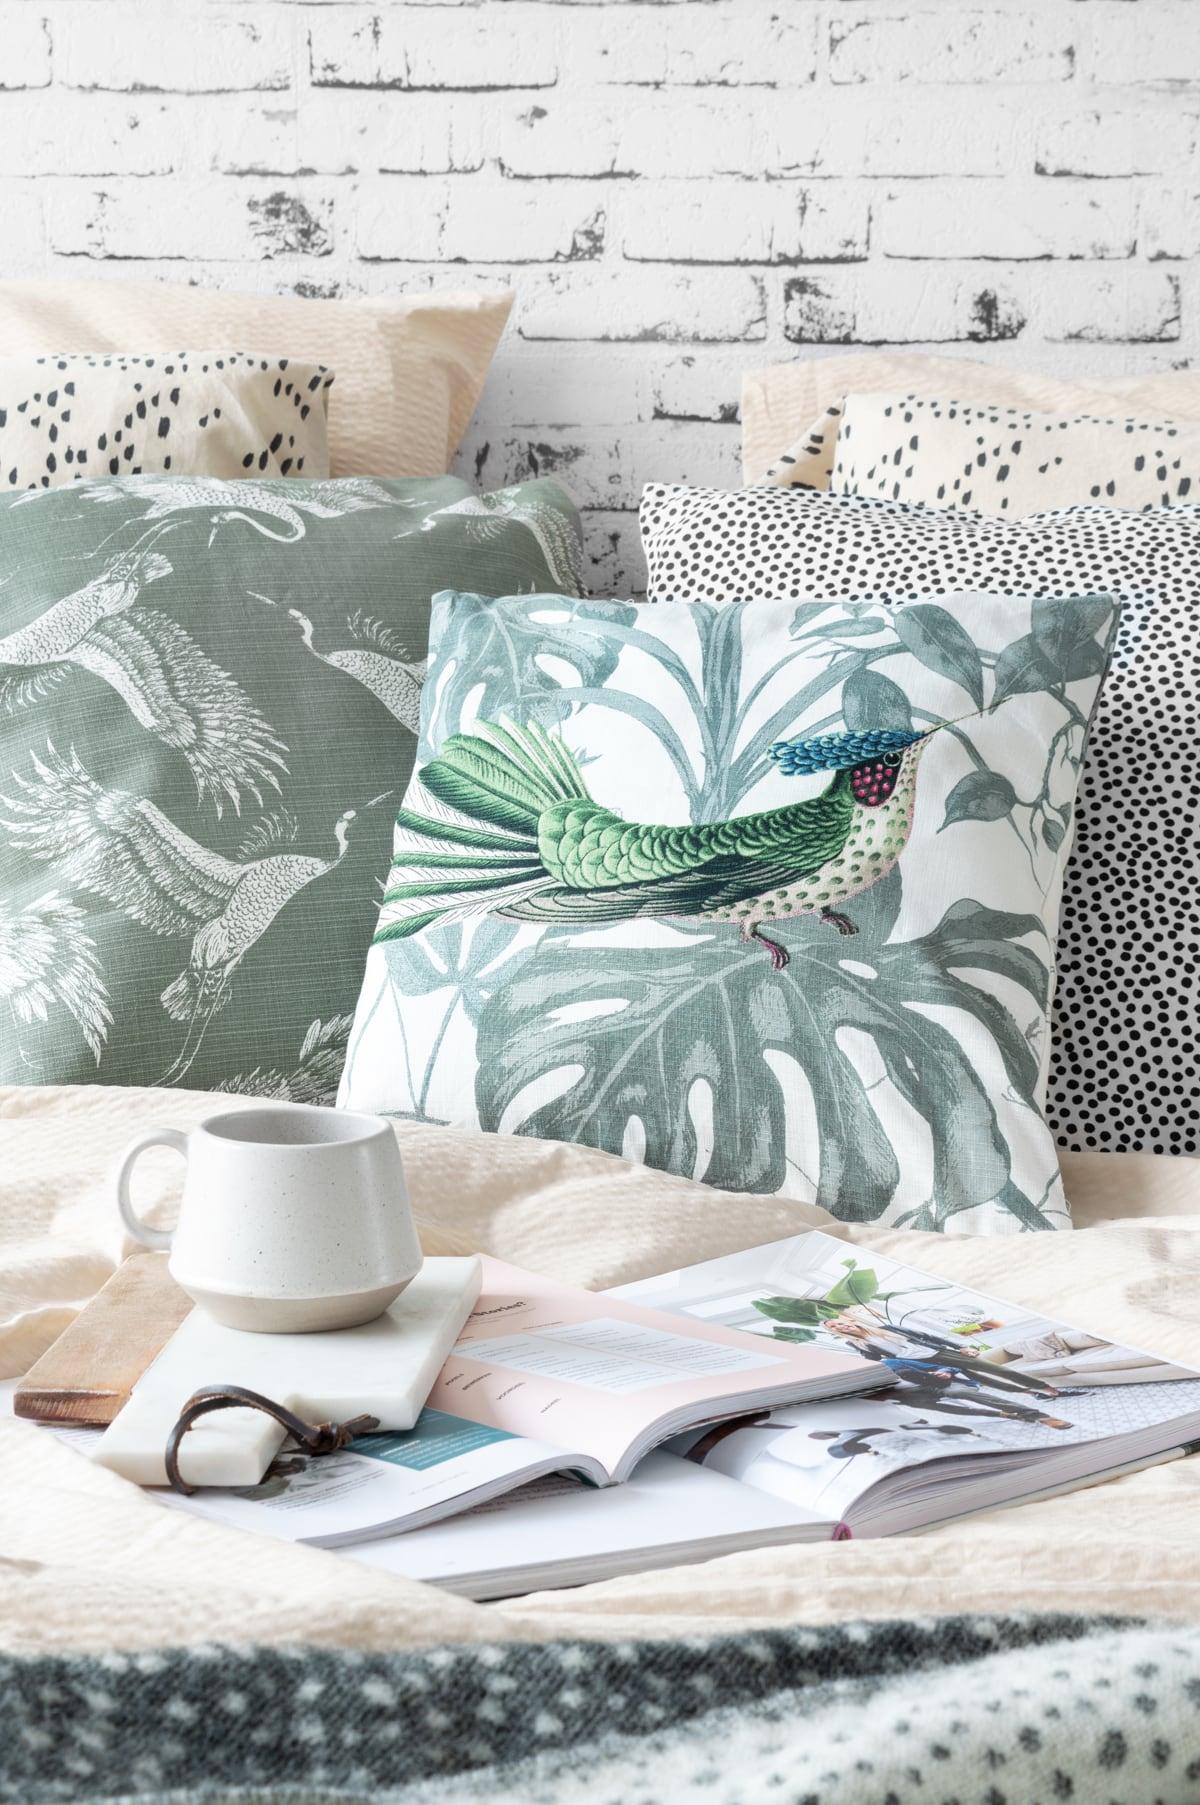 Kussen vogel styling prints in de slaapkamer - Tanja van Hoogdalem